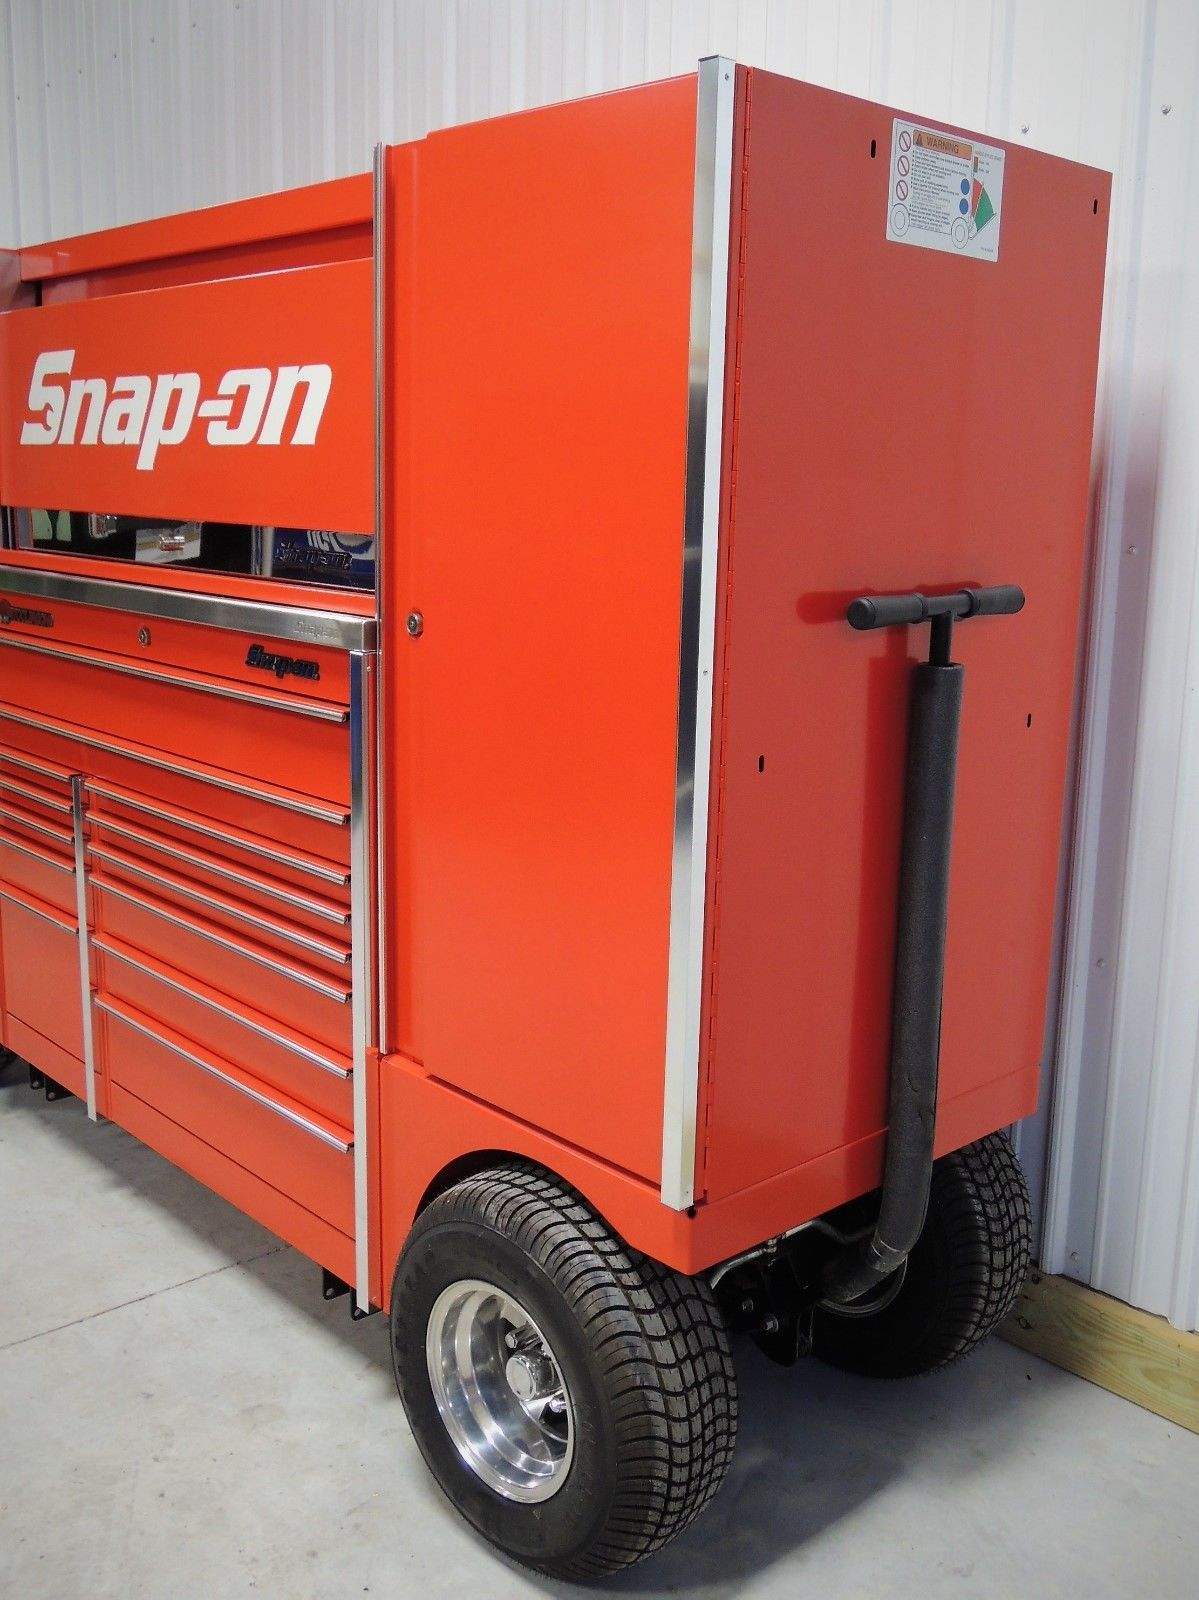 Snap On Krlp1022 Red Tuv Pit Box Tool Wagon Tool Box We Ship Ebay Tool Box Tools Garage Addition